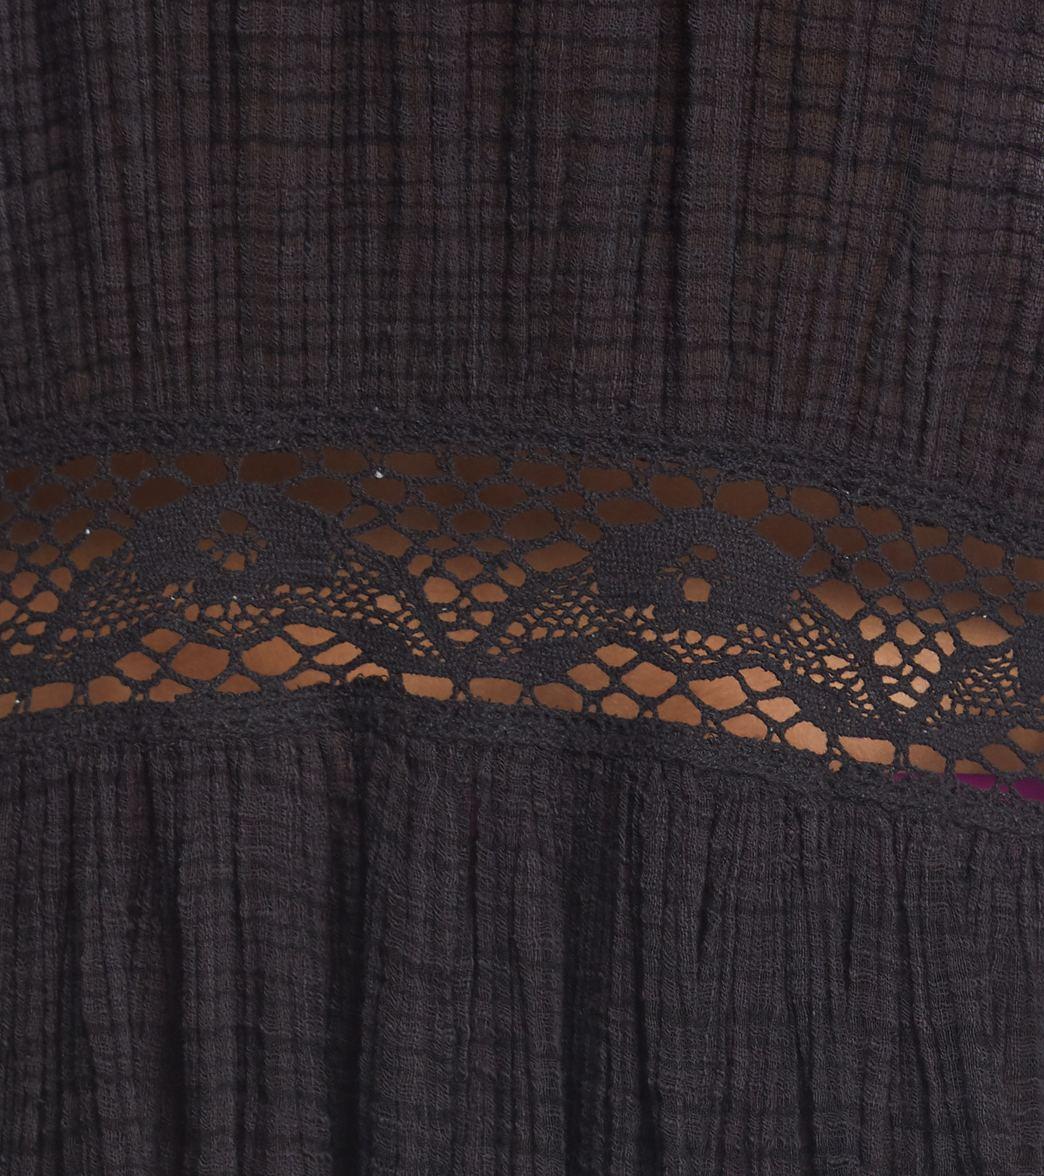 14e9e746e05 O'Neill Lillian Maxi Cover Up Dress at SwimOutlet.com - Free Shipping